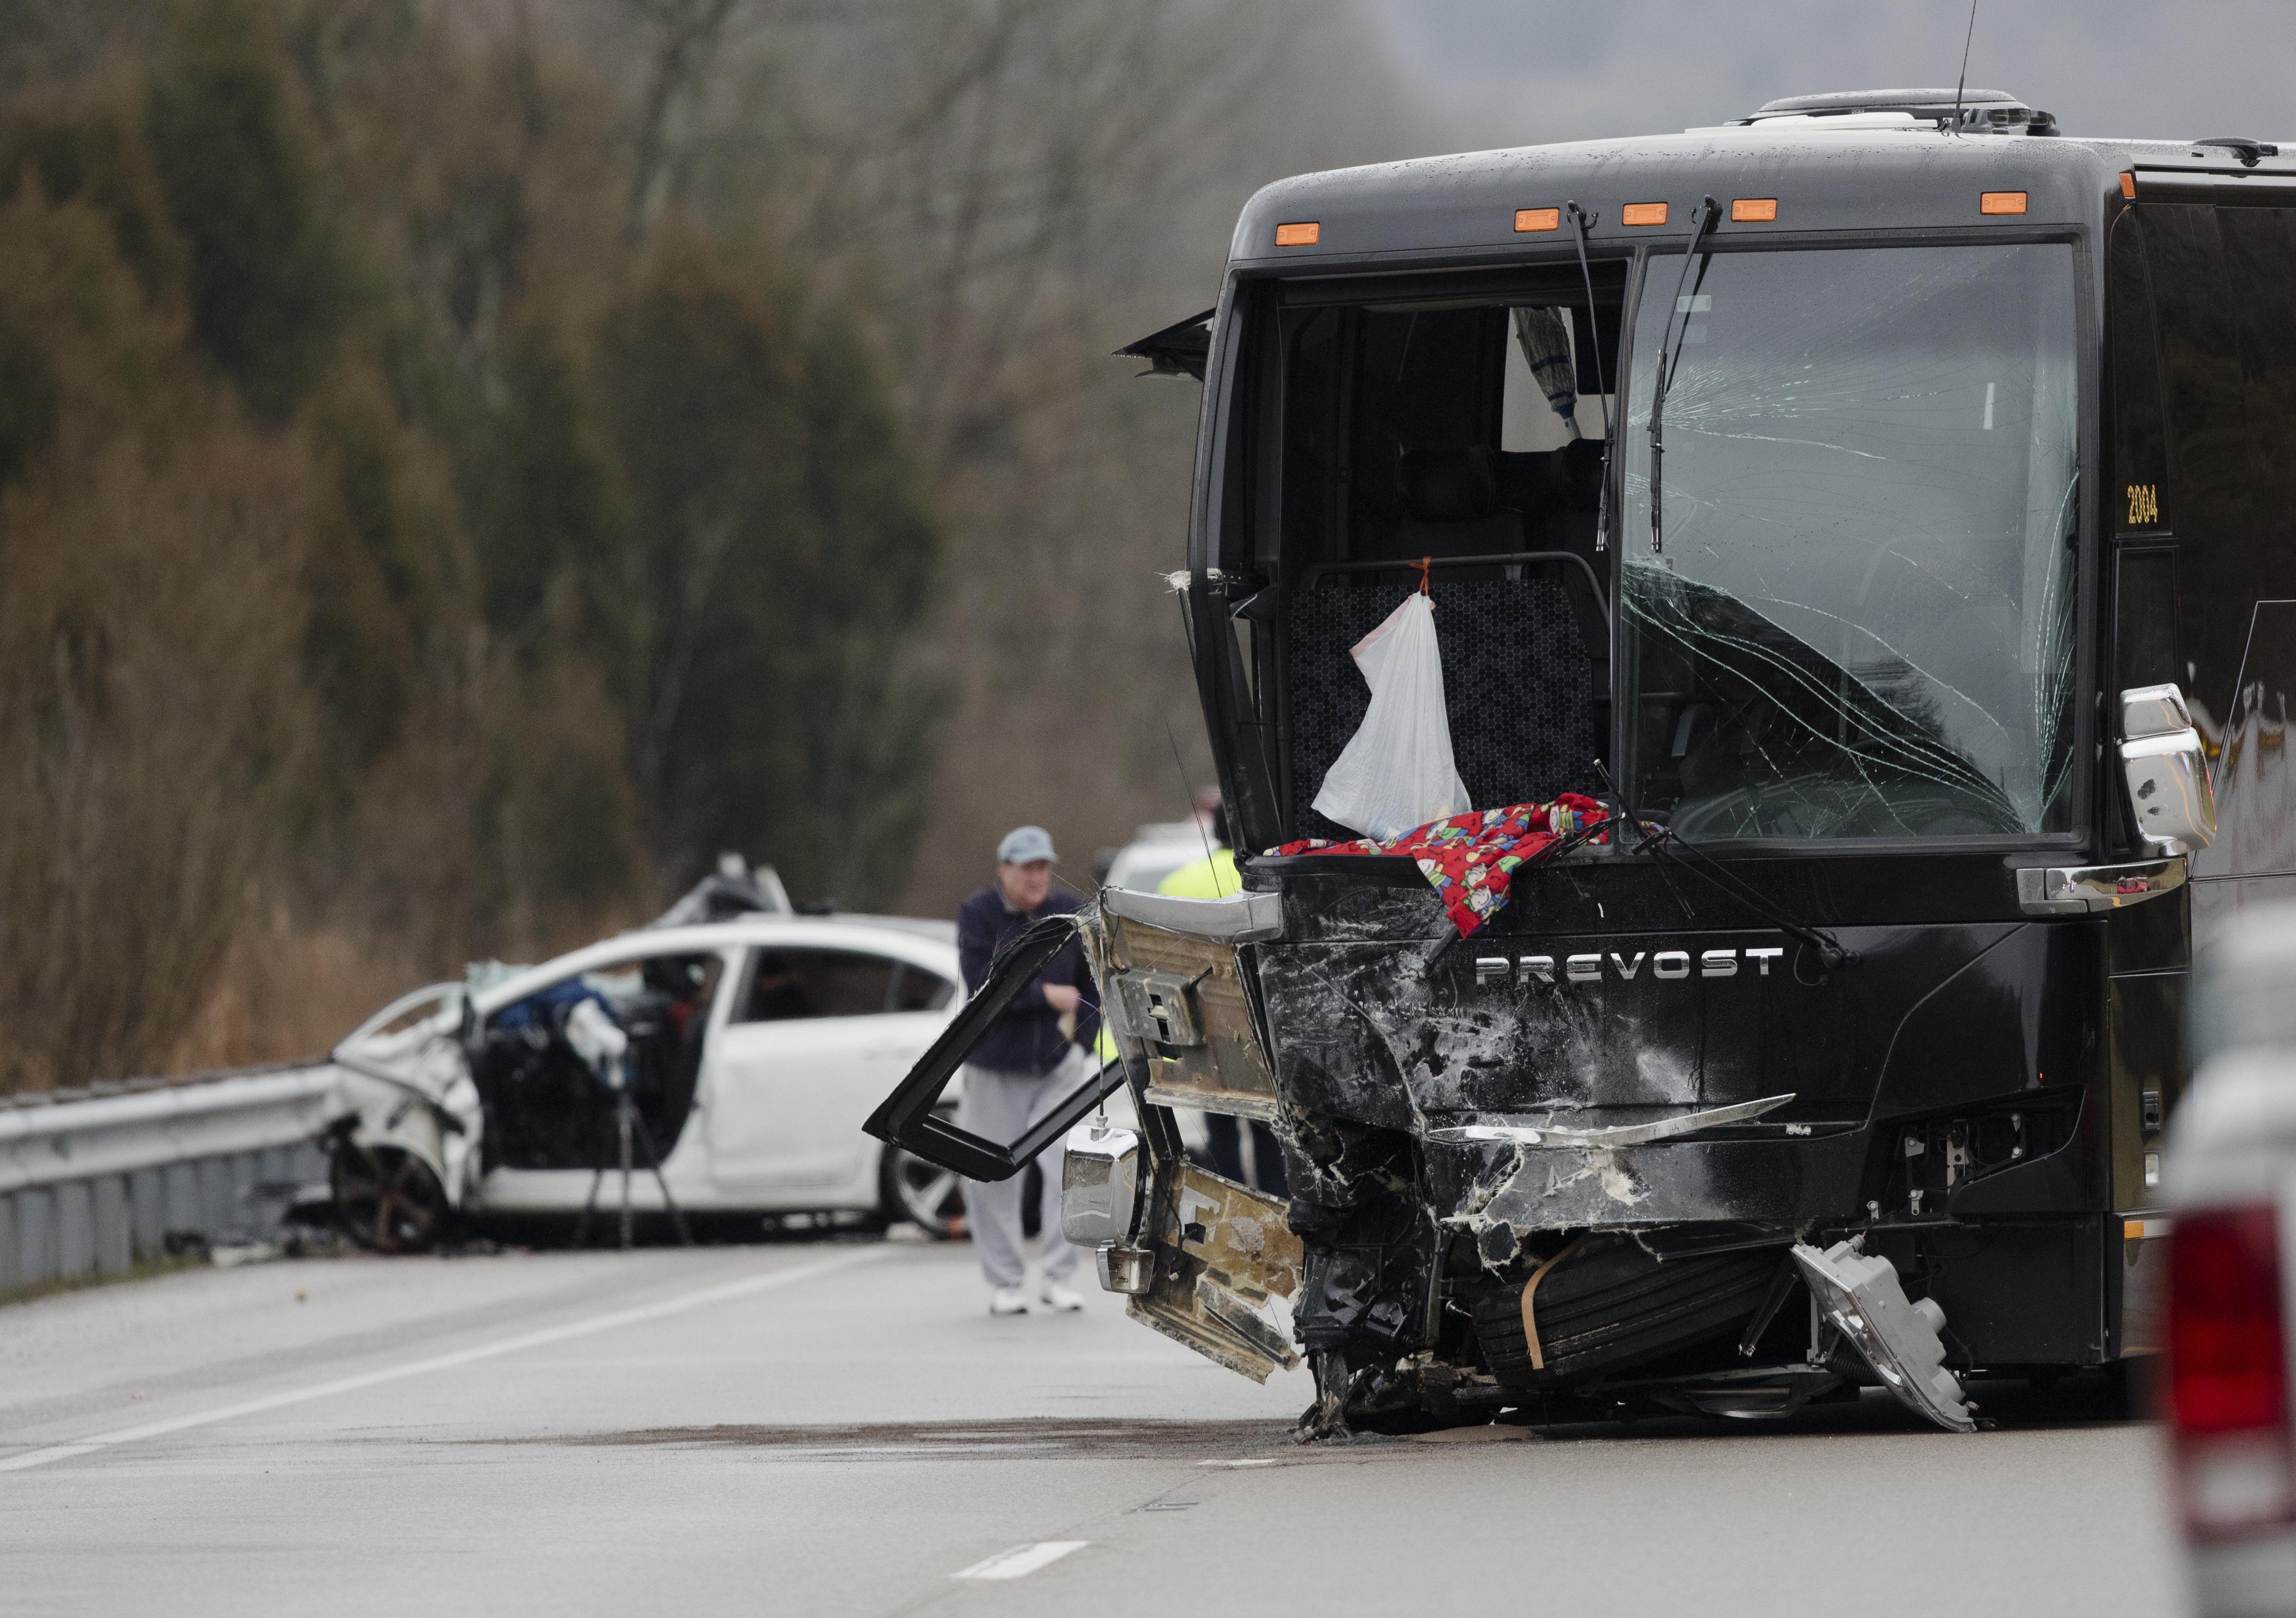 Covington Catholic High School Bus Involved in Fatal Crash in Kentucky